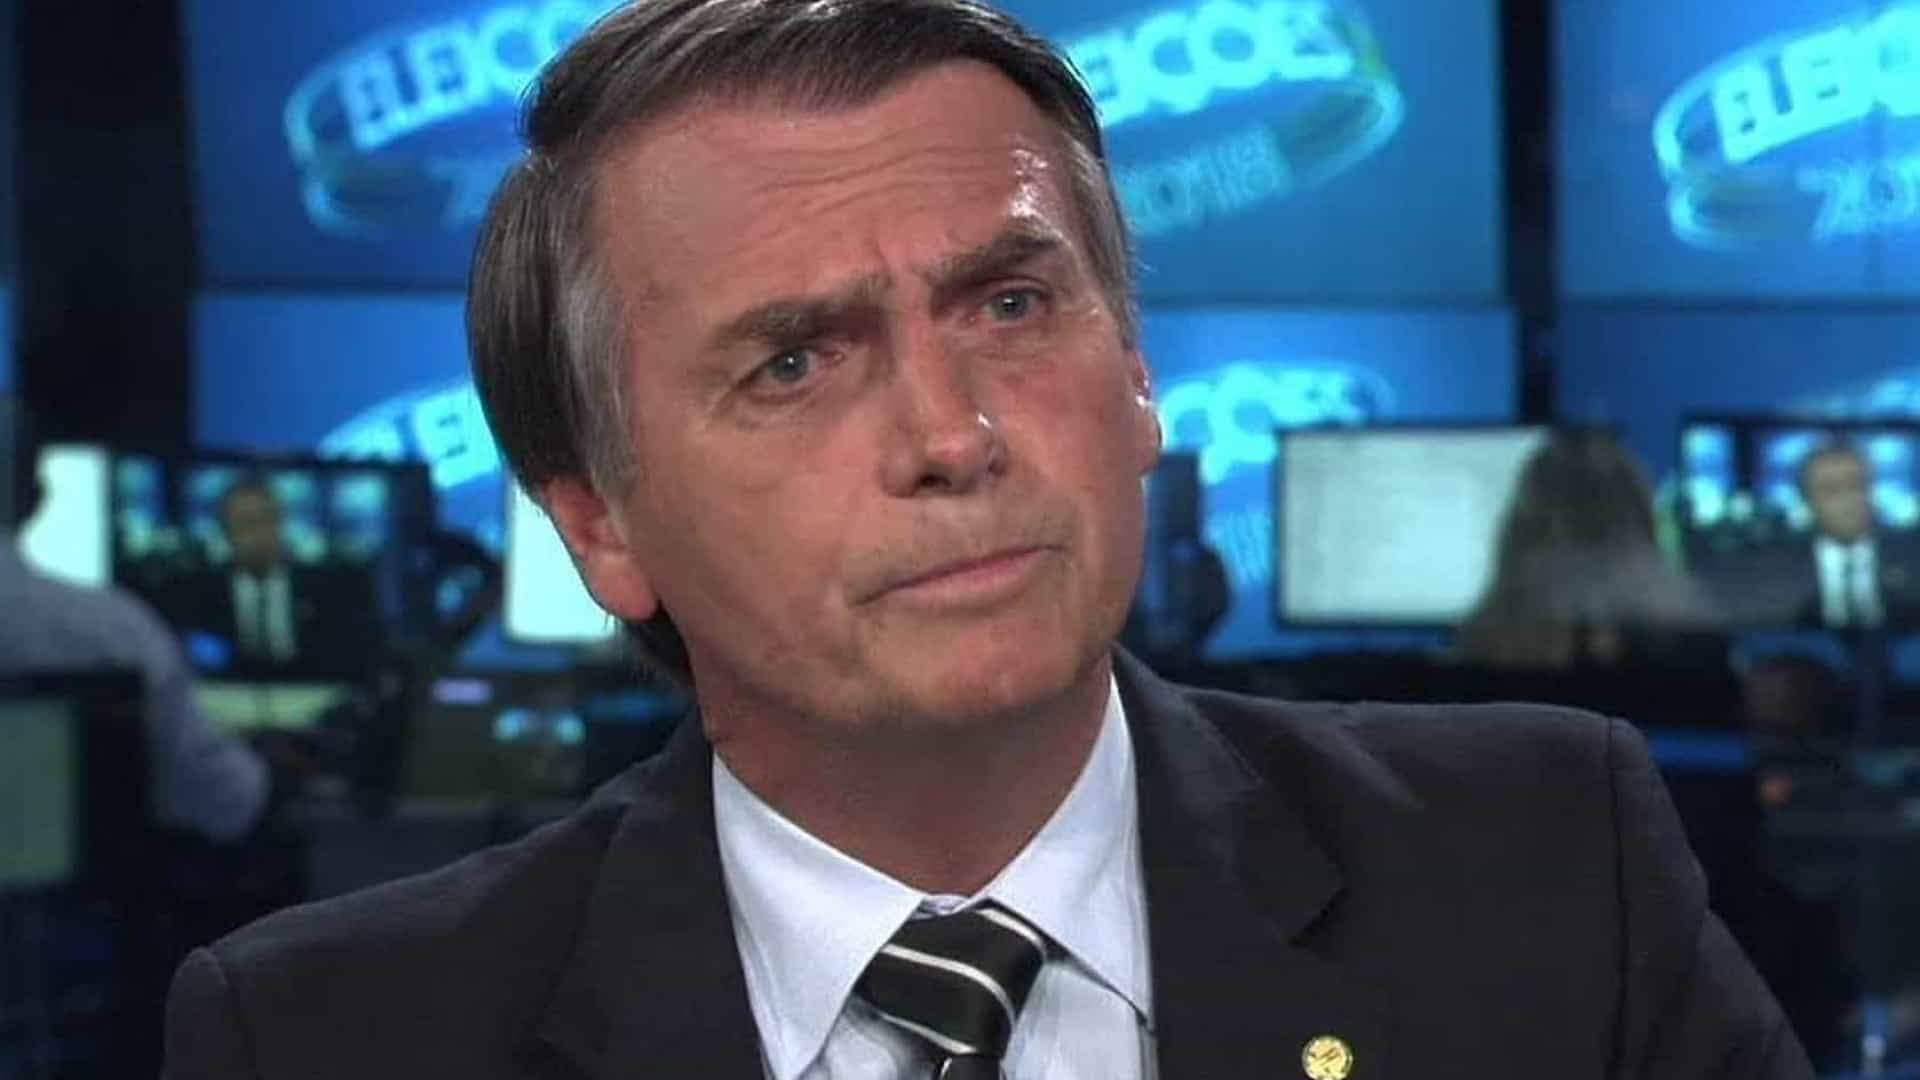 Globo rebate Bolsonaro sobre polêmica da ditadura: 'Ta brincando?'